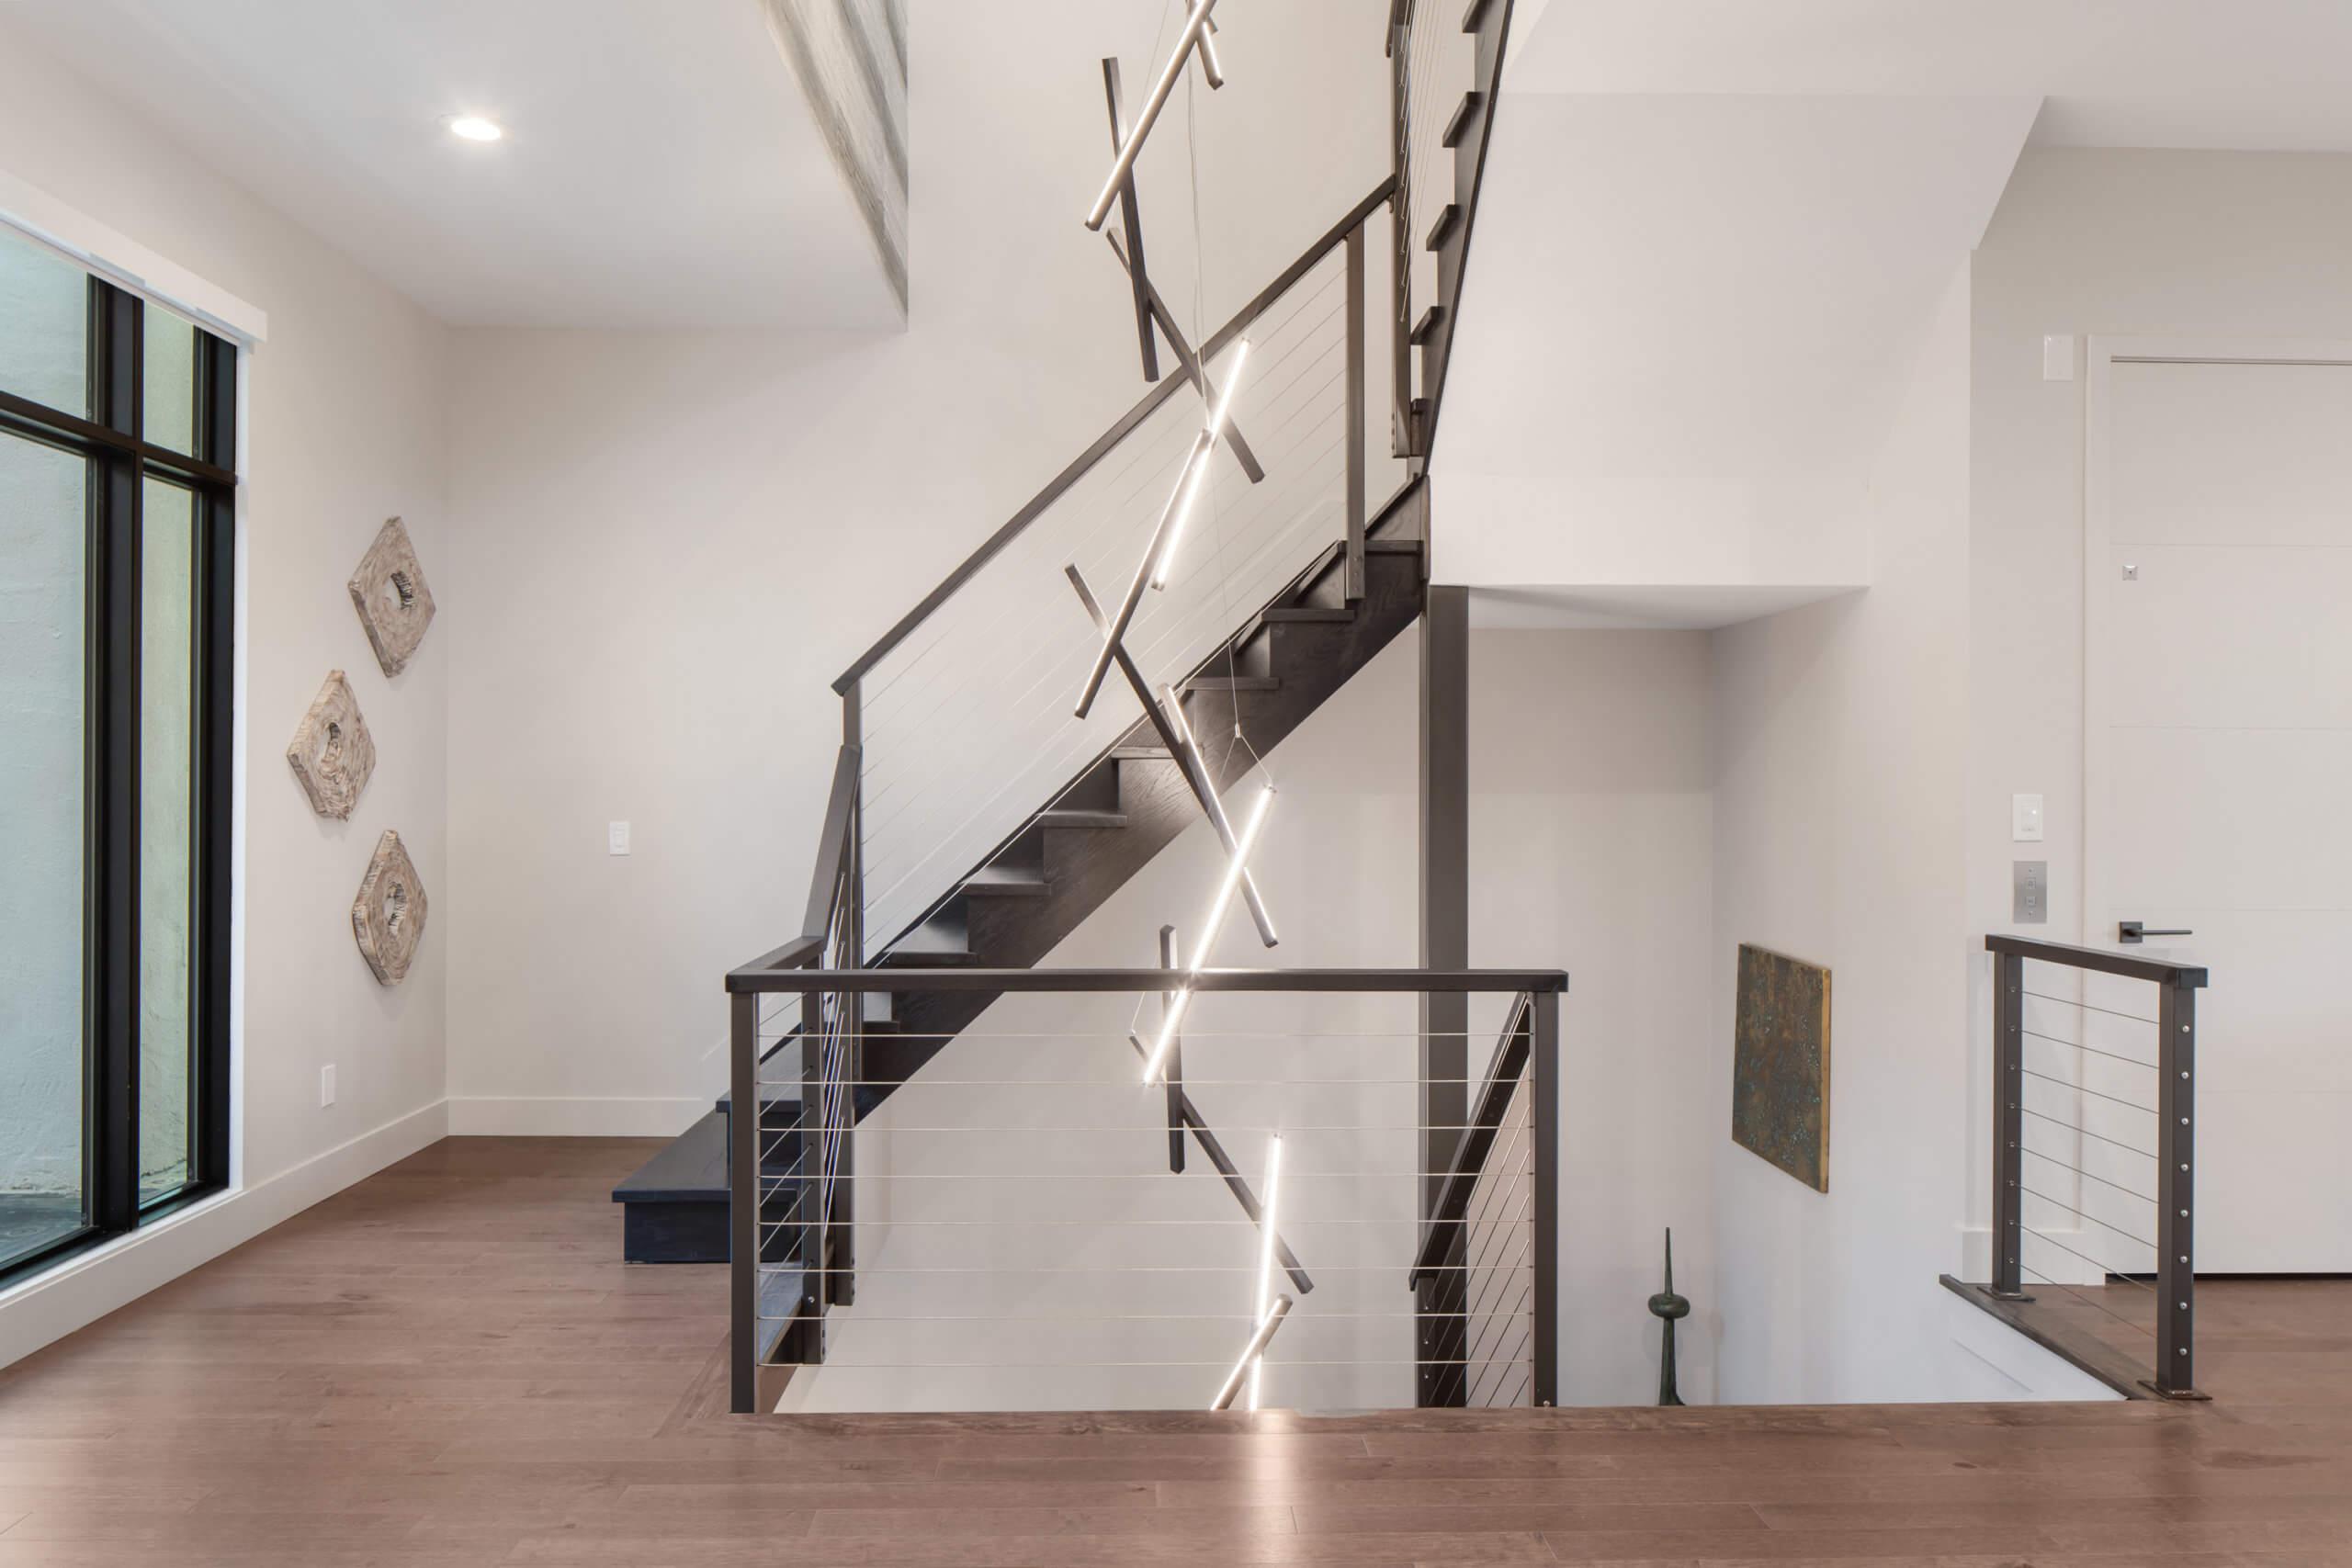 Open stairway features a custom 3 story tall chandelier. Lighting design and interiors designed by Cincinnati's premiere contemporary interior designer, Renan Menninger.